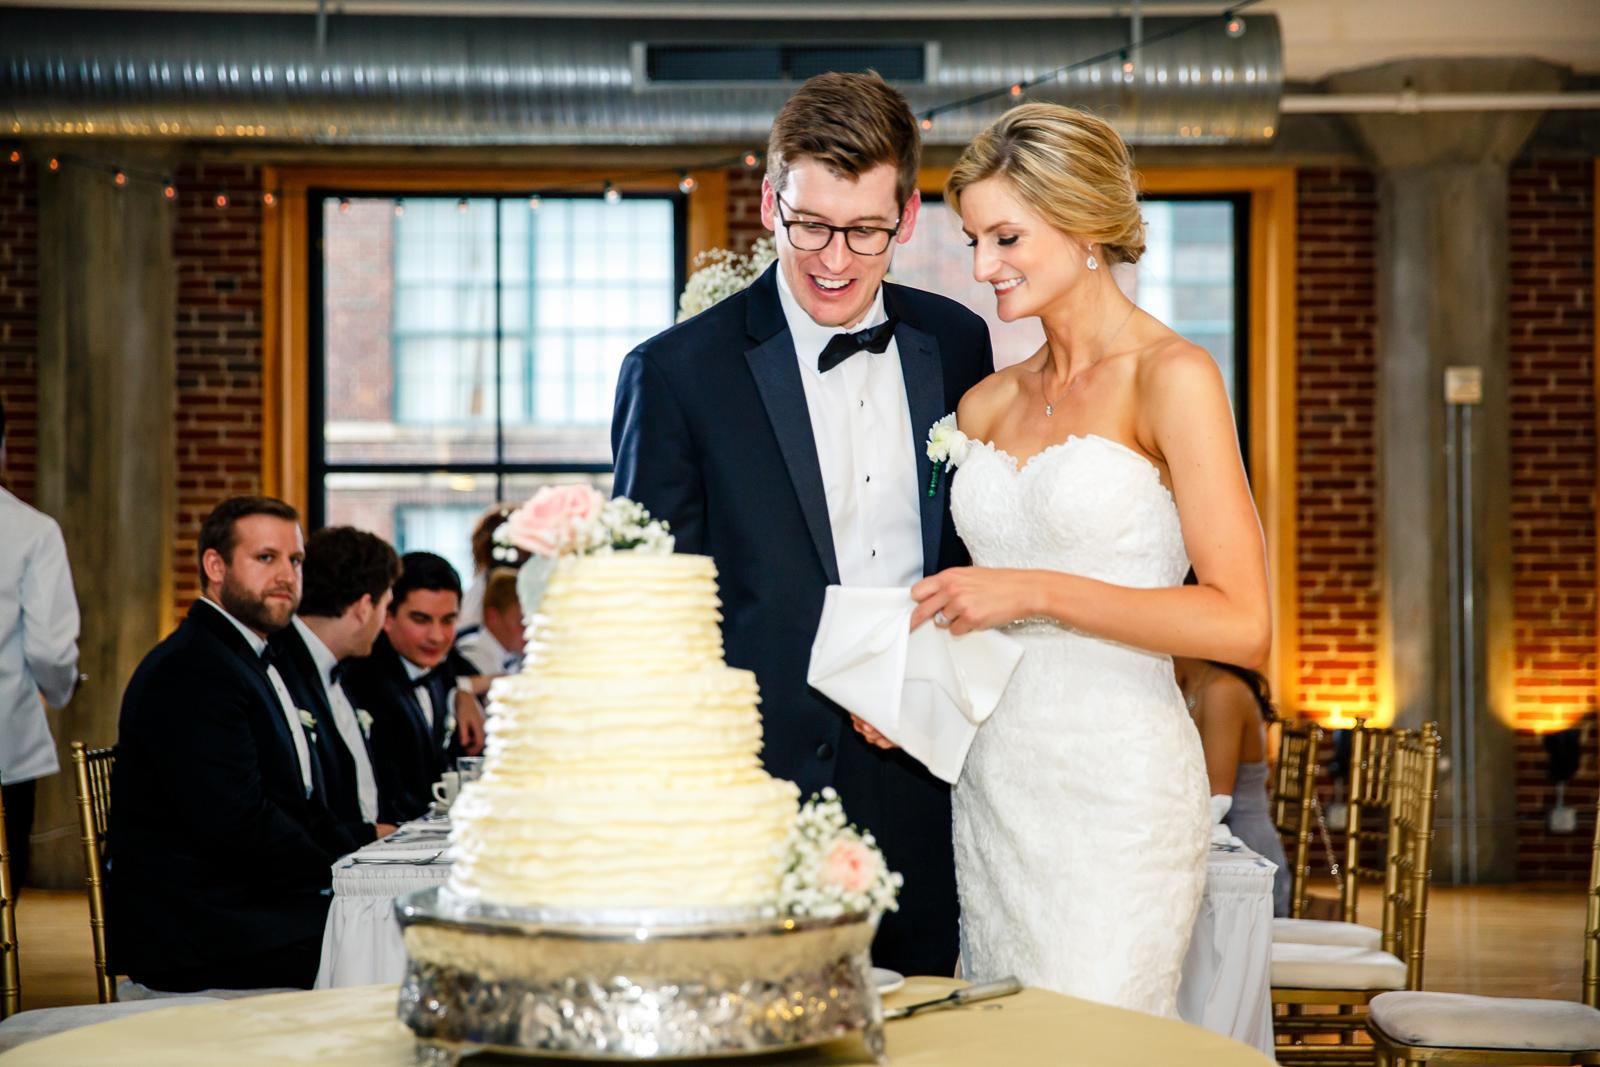 Gold Reception Windows on Washington Cutting Cake Bride Groom St Louis Wedding Photographer by Oldani Photography.jpg